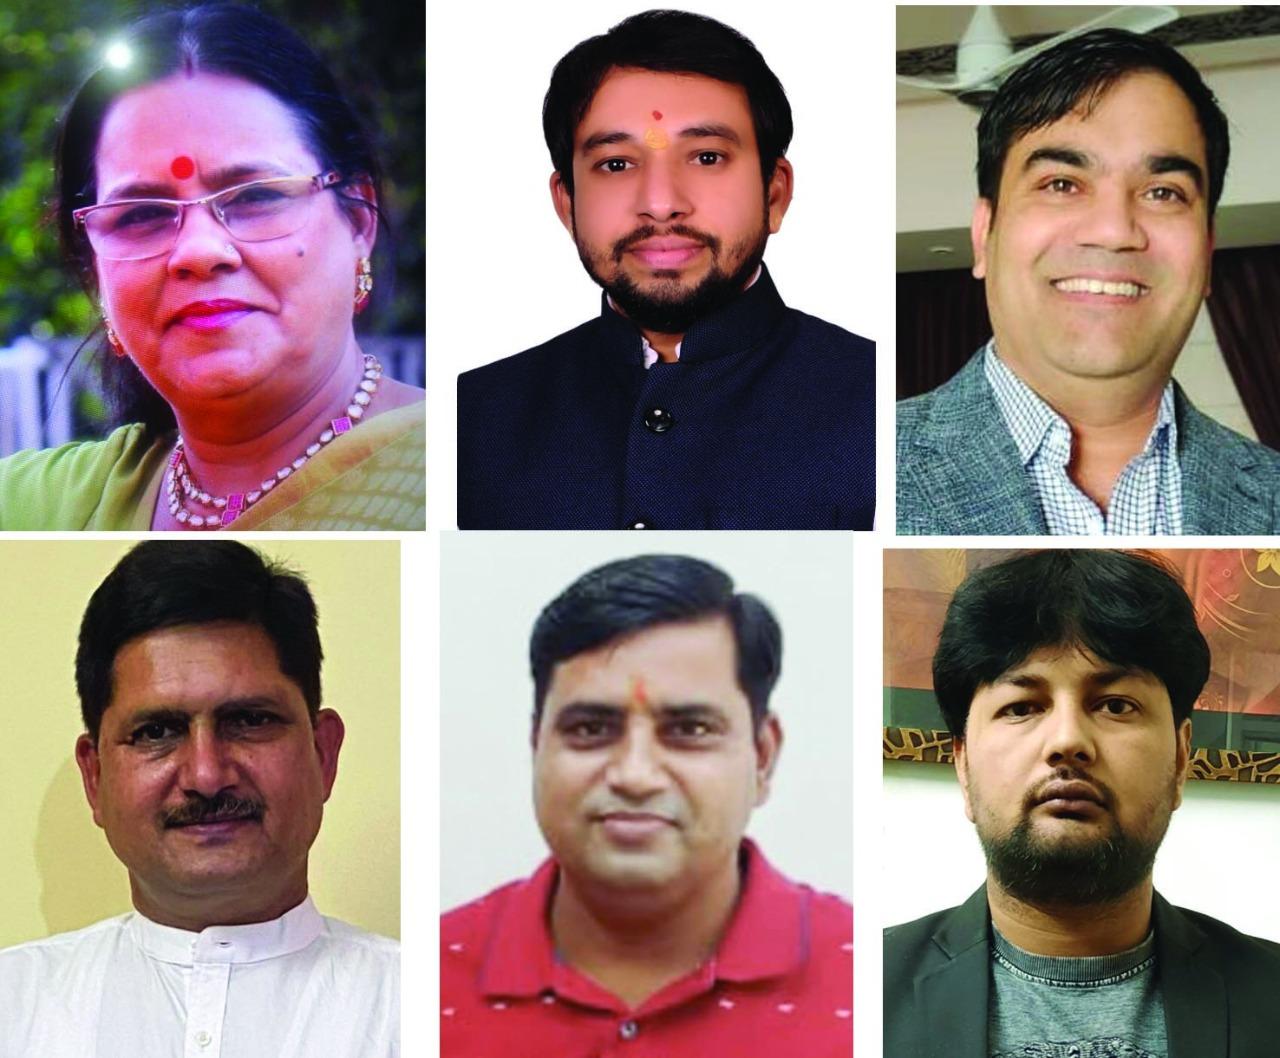 सत्य प्रताप शर्मा, अजय शर्मा, नरोत्तम वत्स व अभिषेक ठाकुर ने बनाया अस्पताल